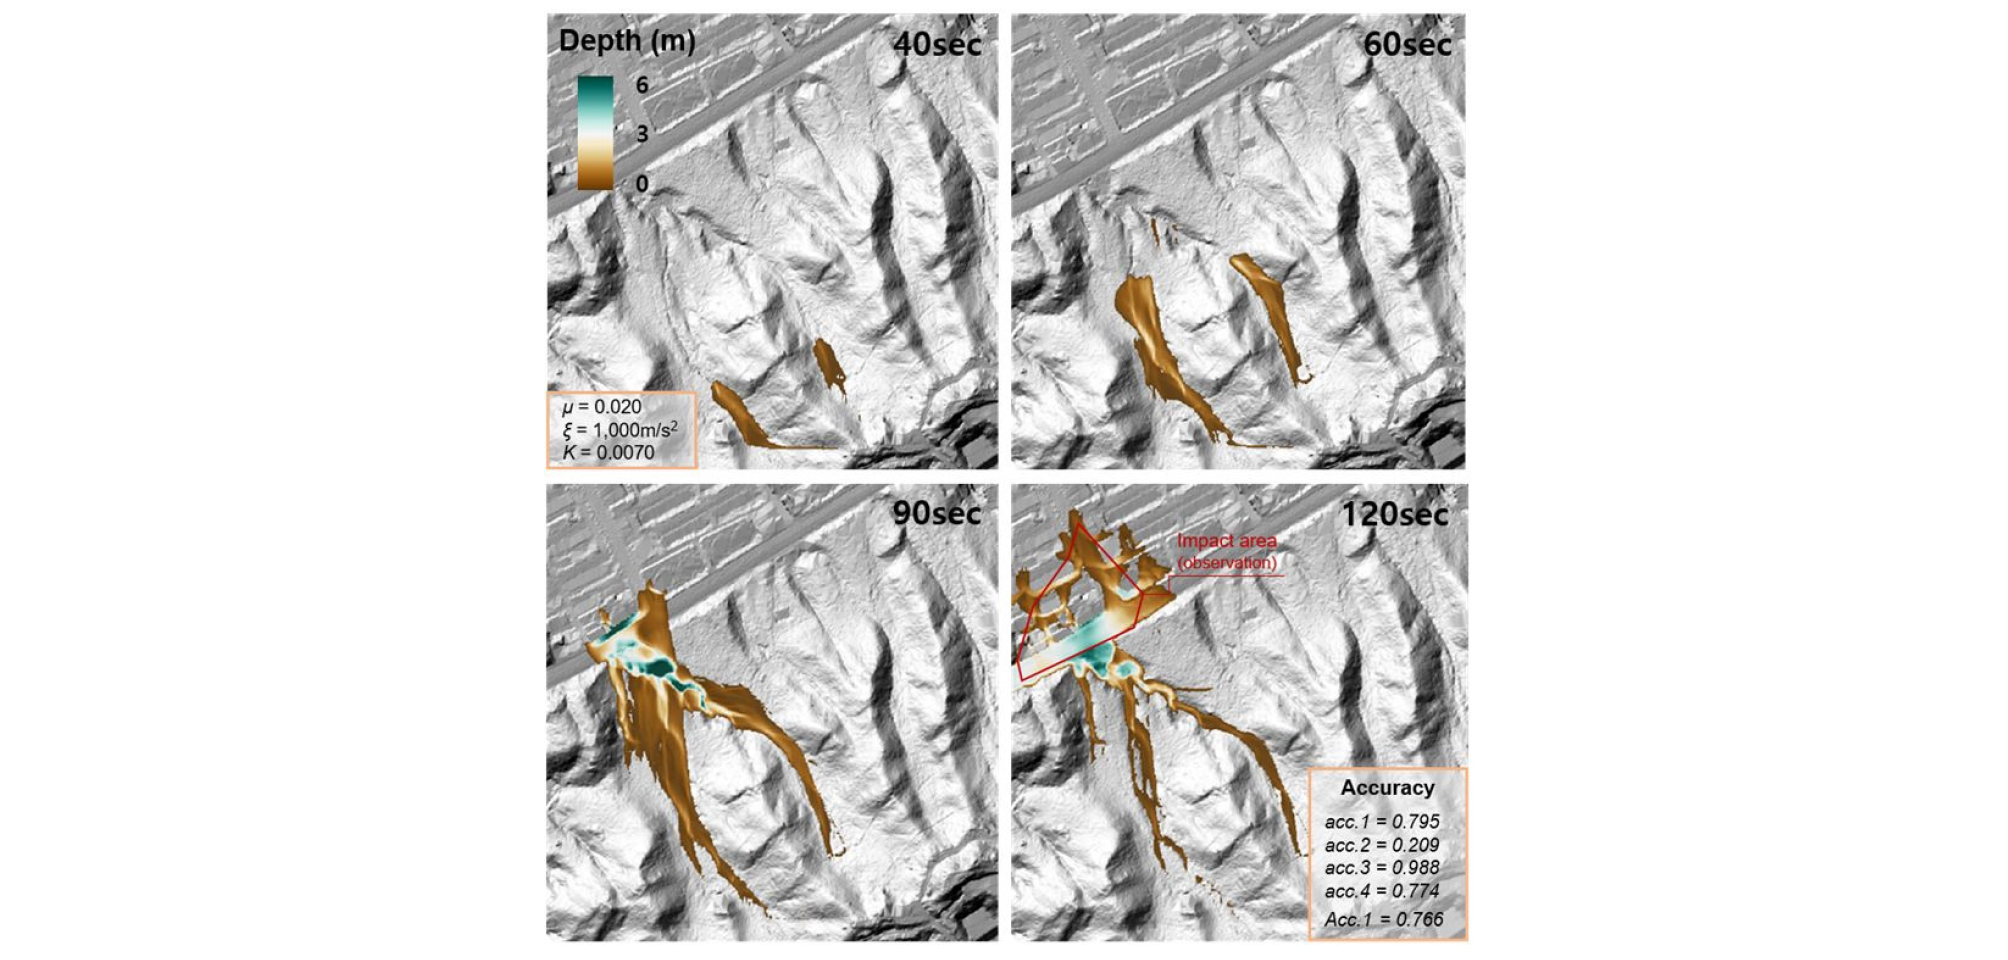 http://static.apub.kr/journalsite/sites/kwra/2020-053-09/N0200530901/images/kwra_53_09_01_F4.jpg